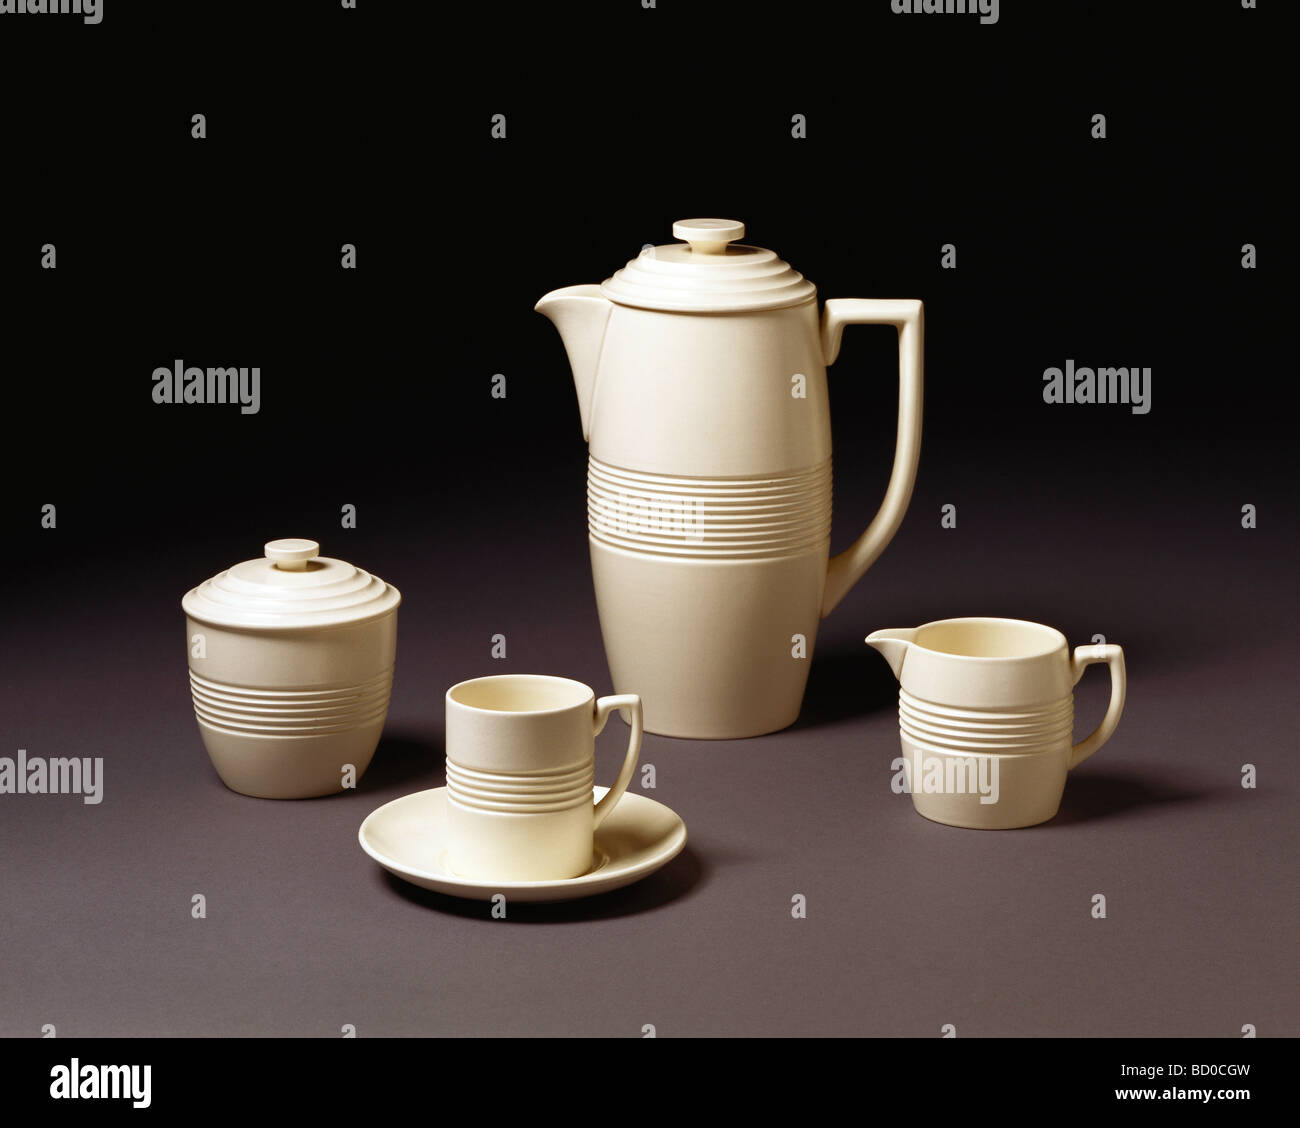 Coffee set, by Keith Murray. Stoke-on-Trent, England, 1933 - Stock Image